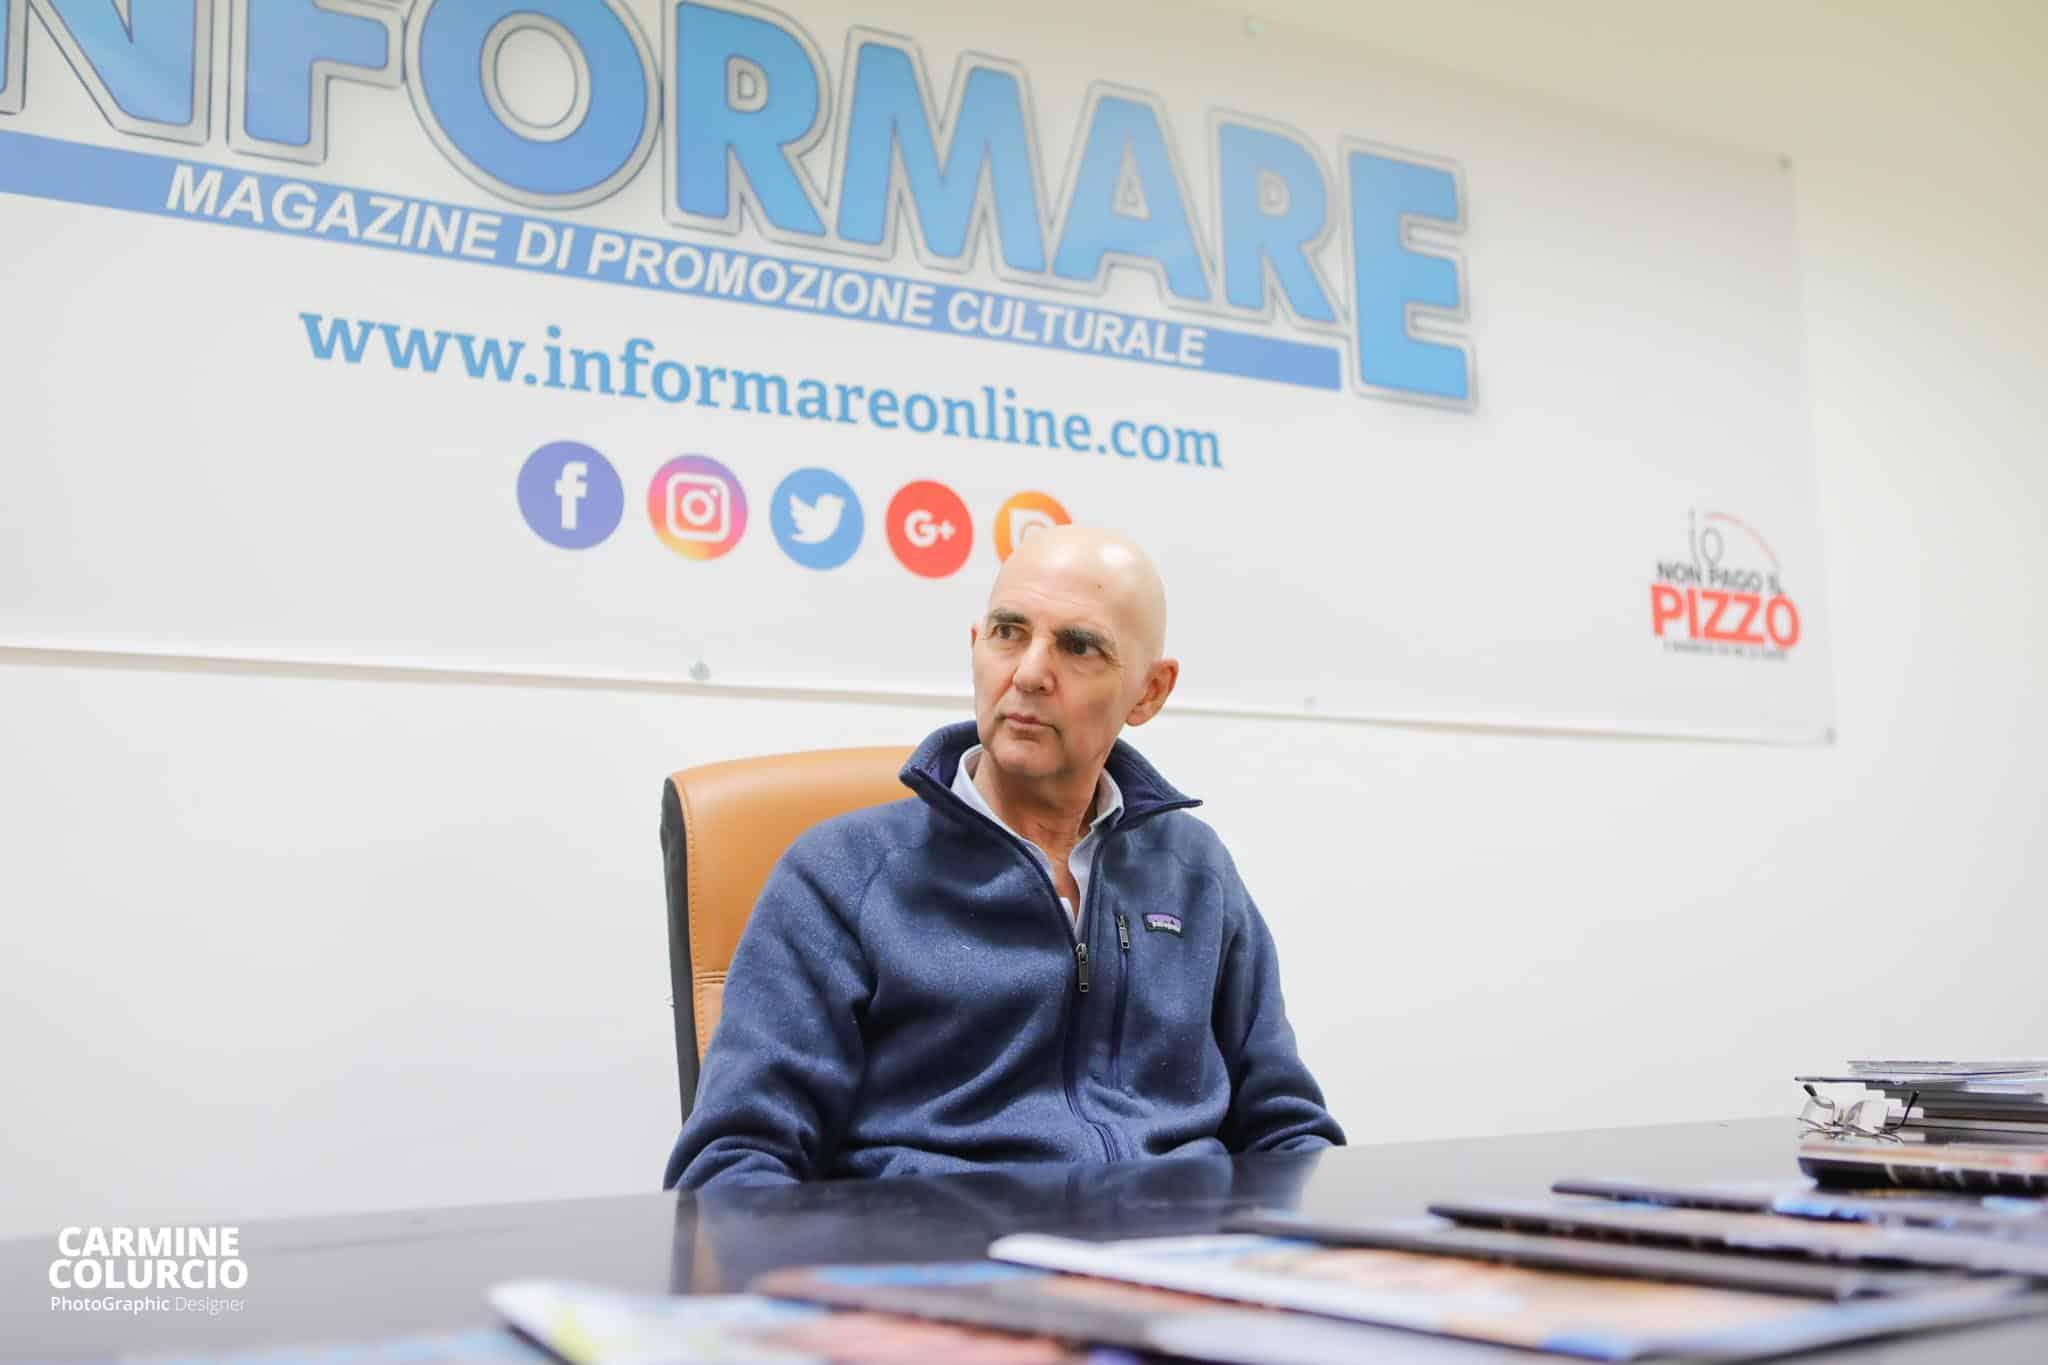 Sandro Petrone - Photo credit Carmine Colurcio